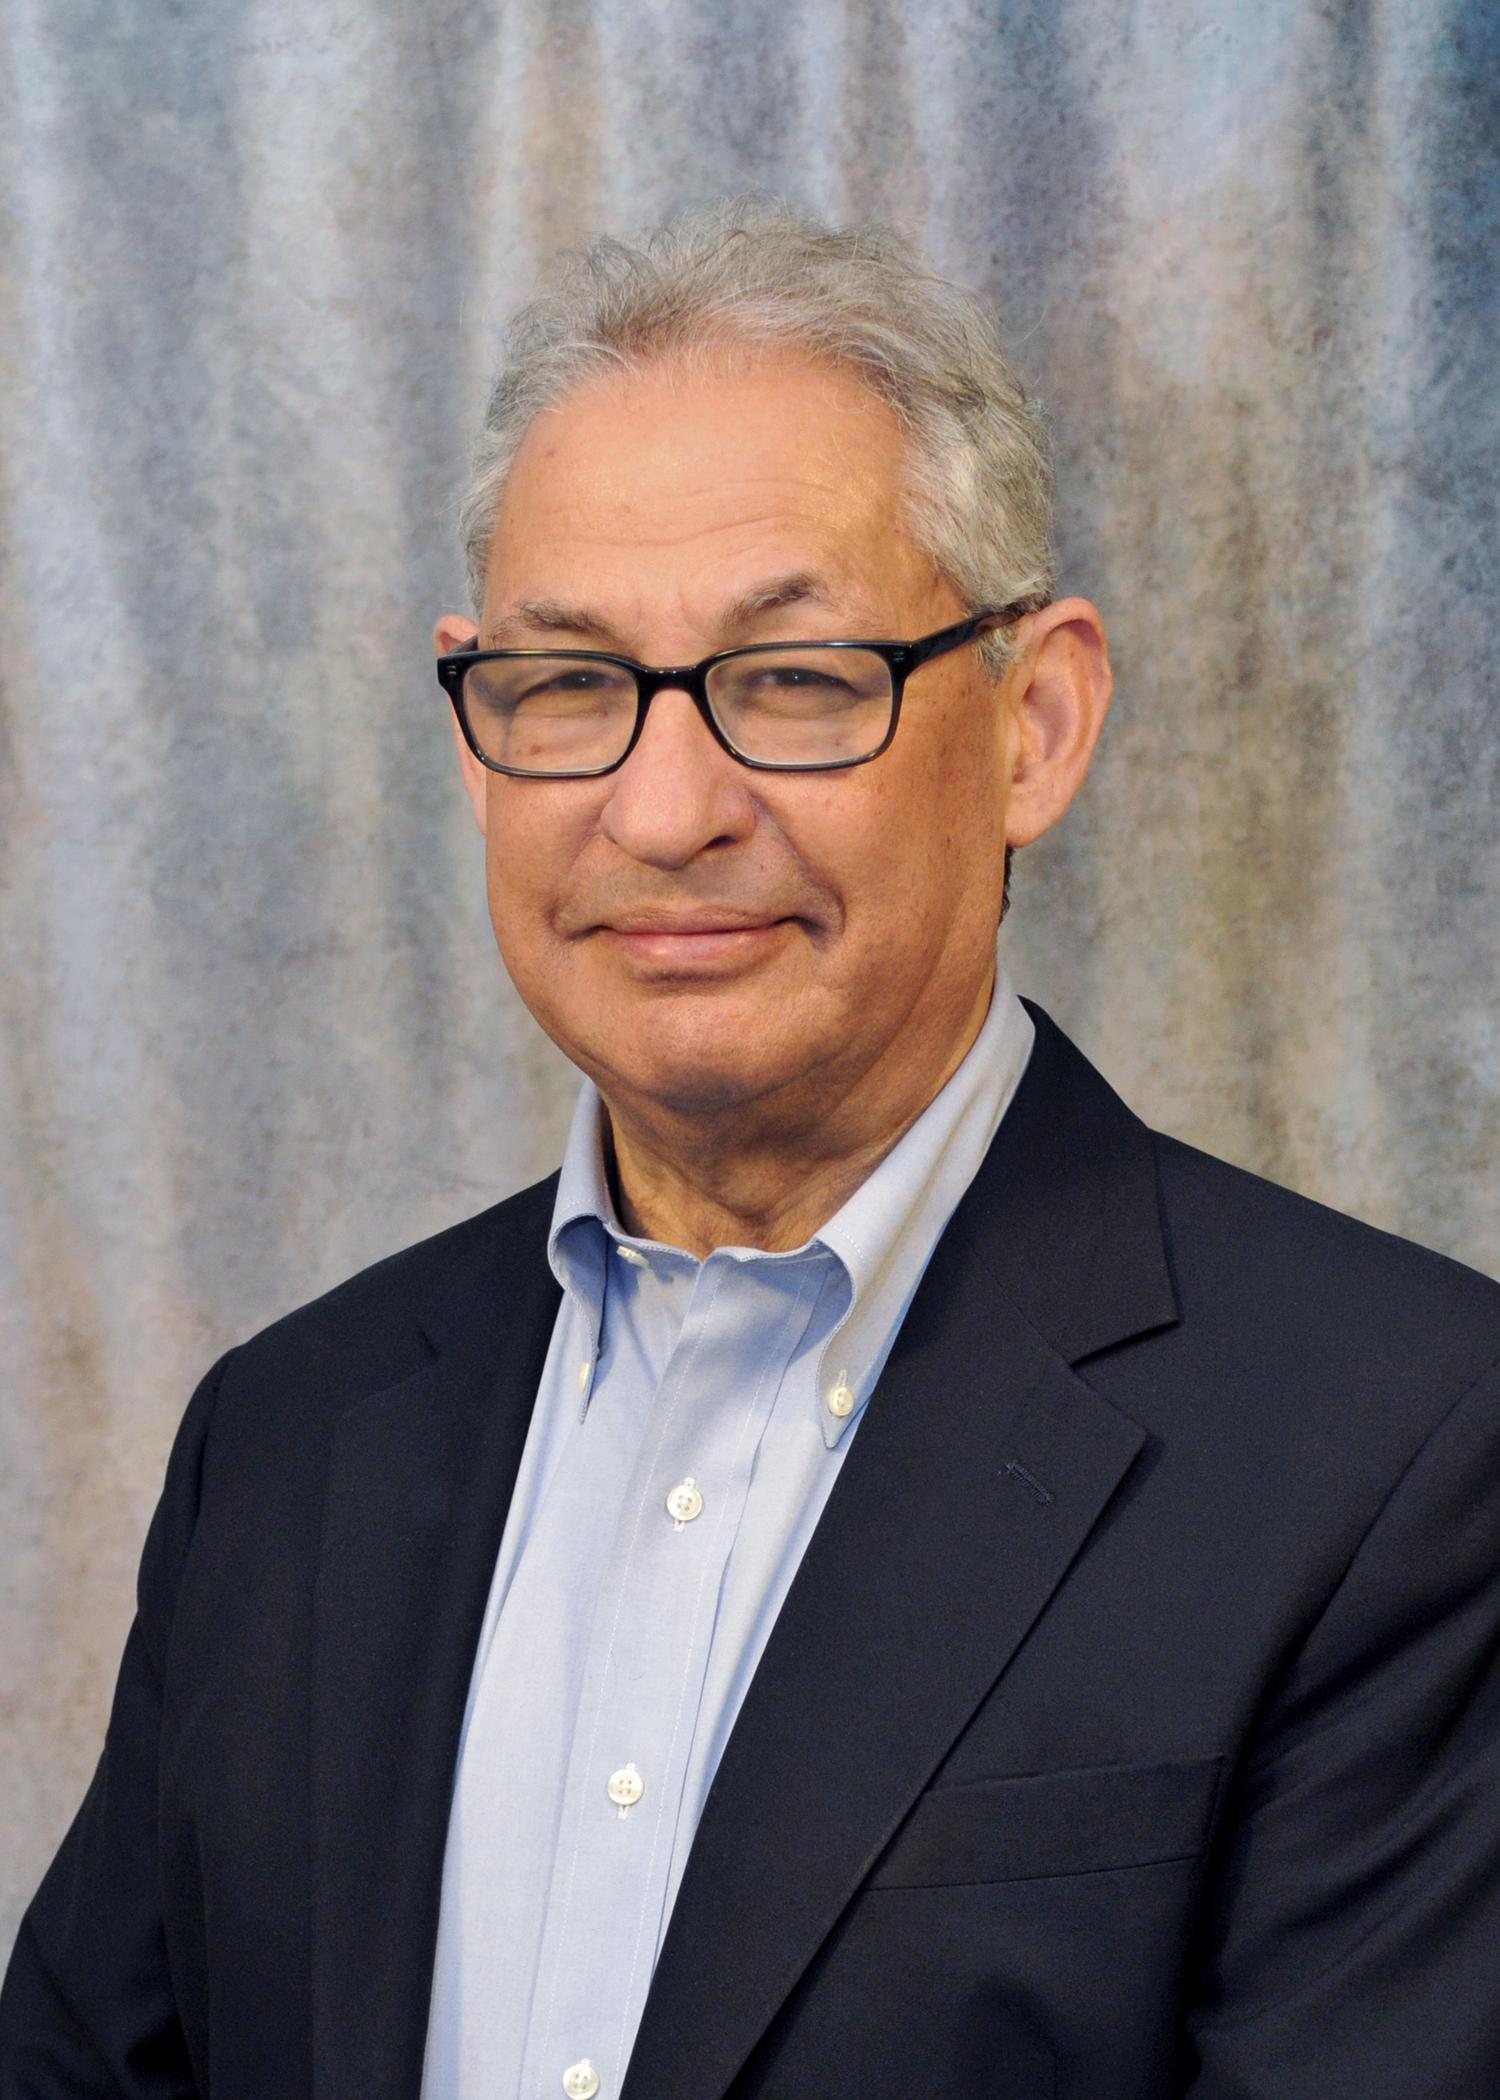 JONATHAN ADELSON, MD — Arthritis and Pain Associates of PG